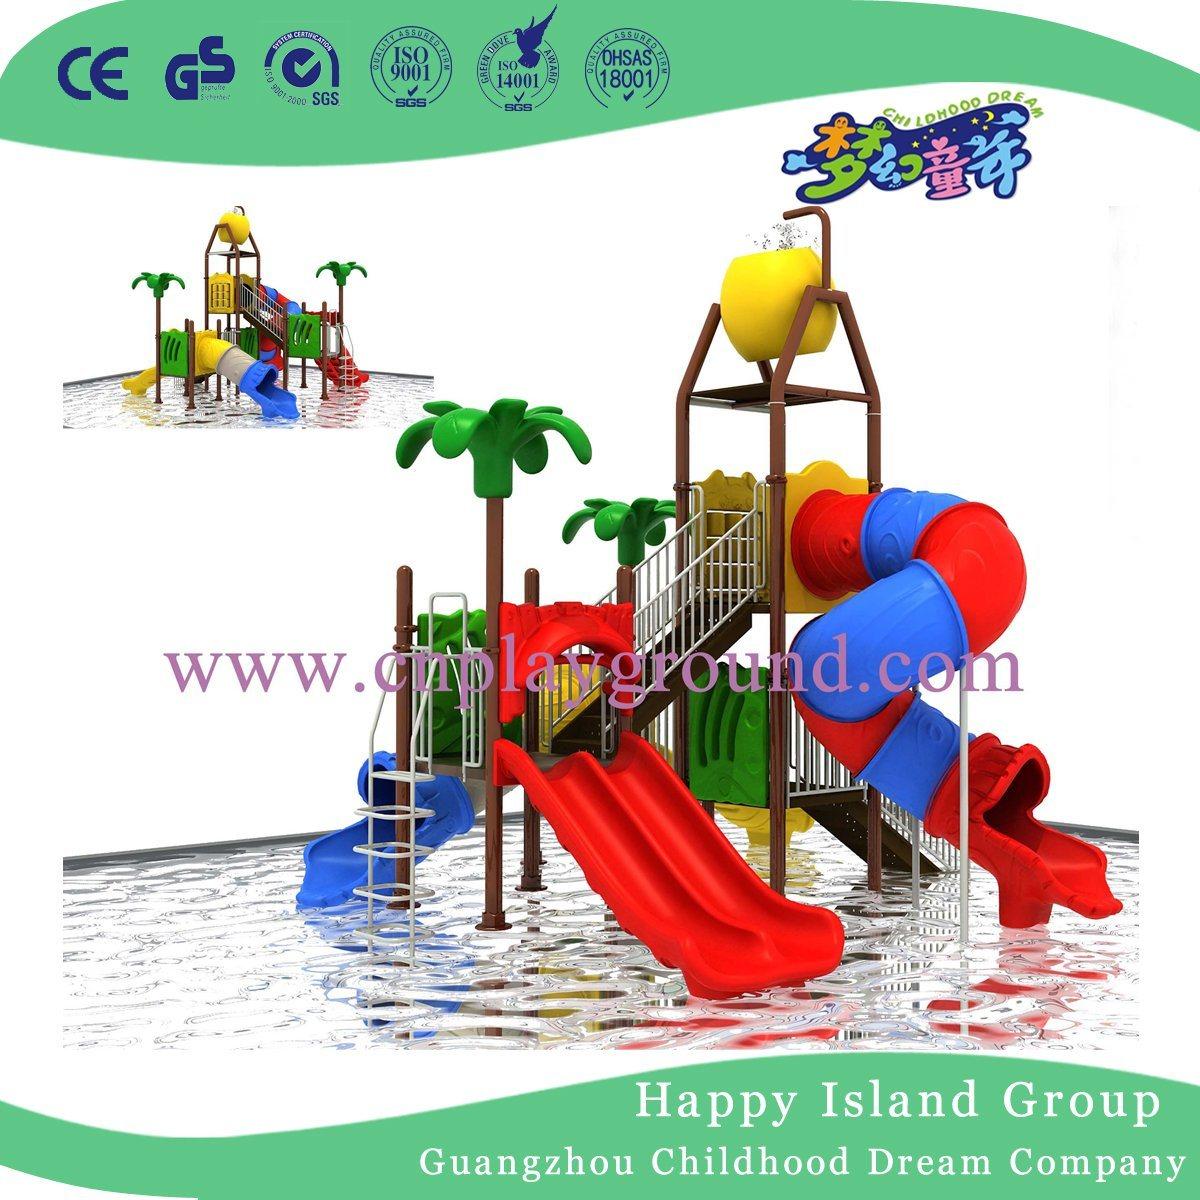 2017 Newest Design Small Playground Equipment Cheap Water Playground for Amusement Park (HF-001)